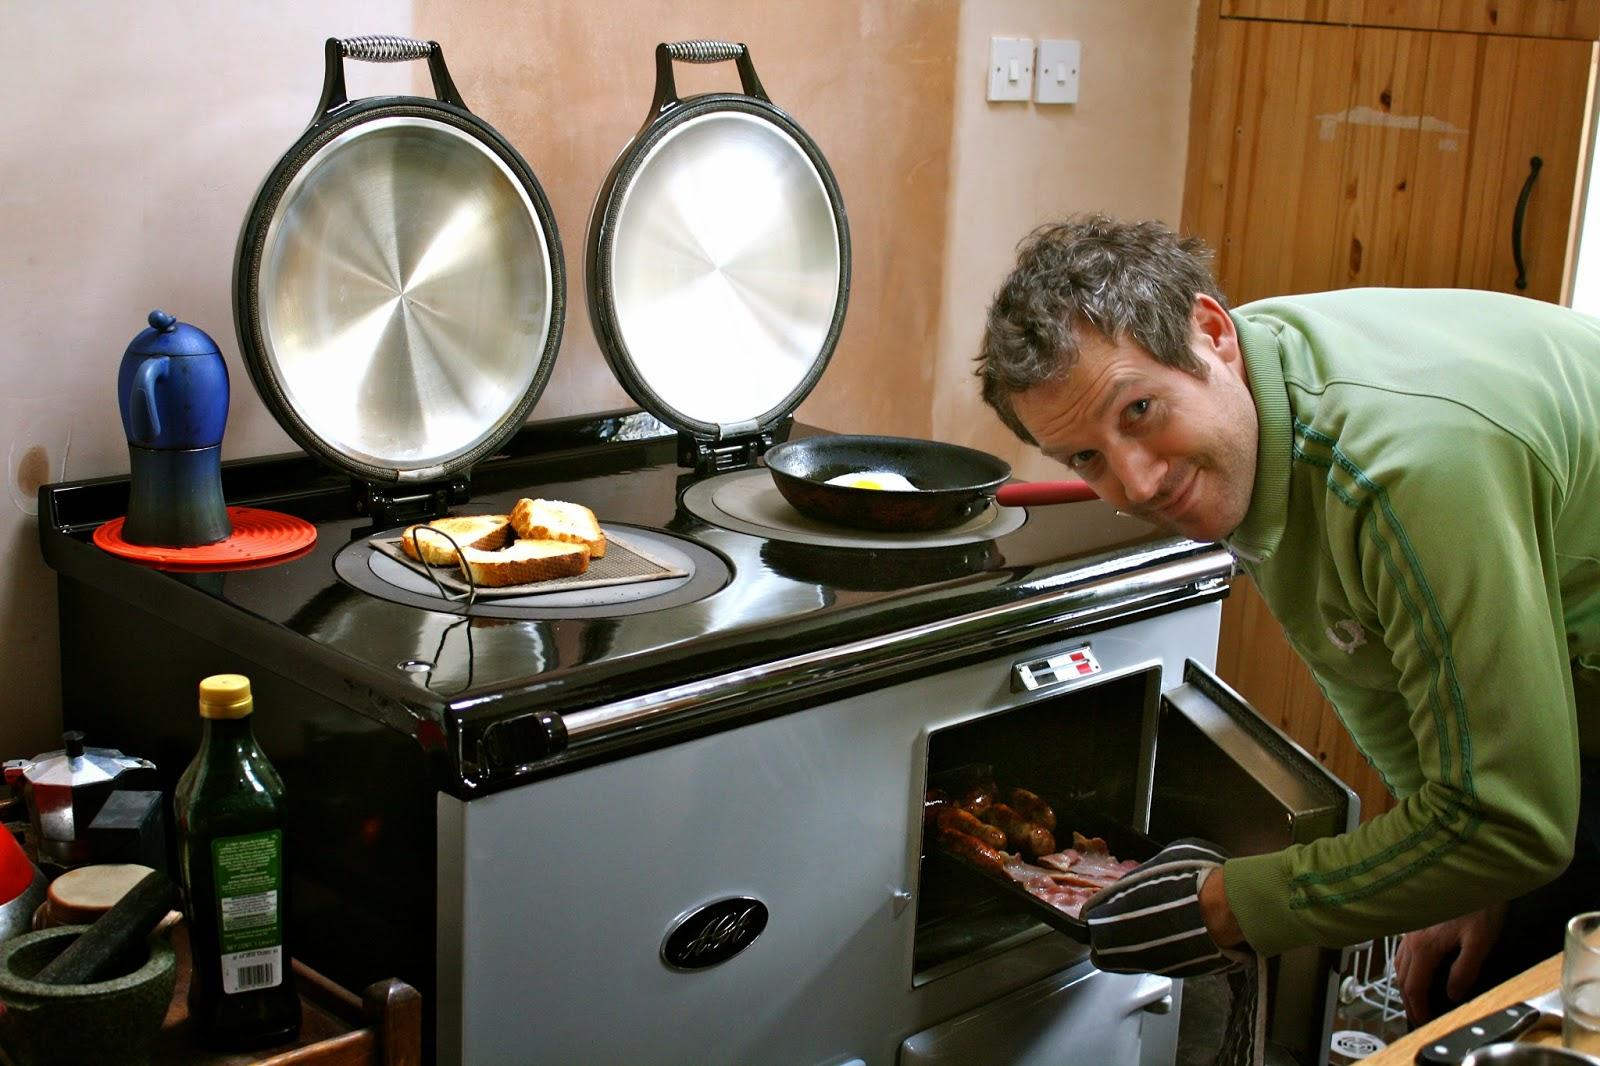 Aga - cooks breakfast